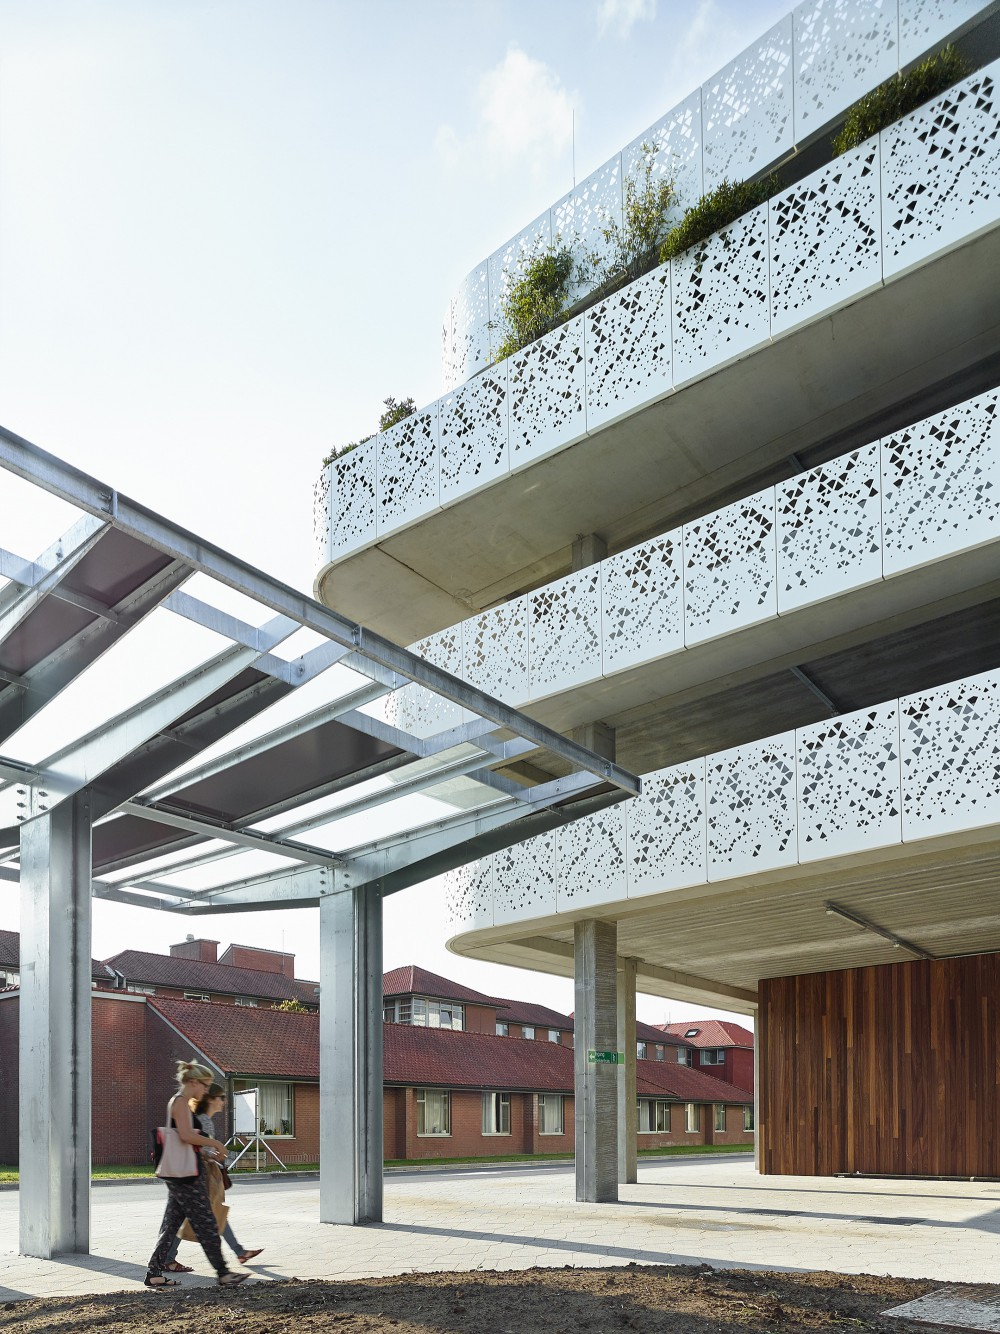 Abscis Architecten - Roofed passage - photography Dennis De Smet